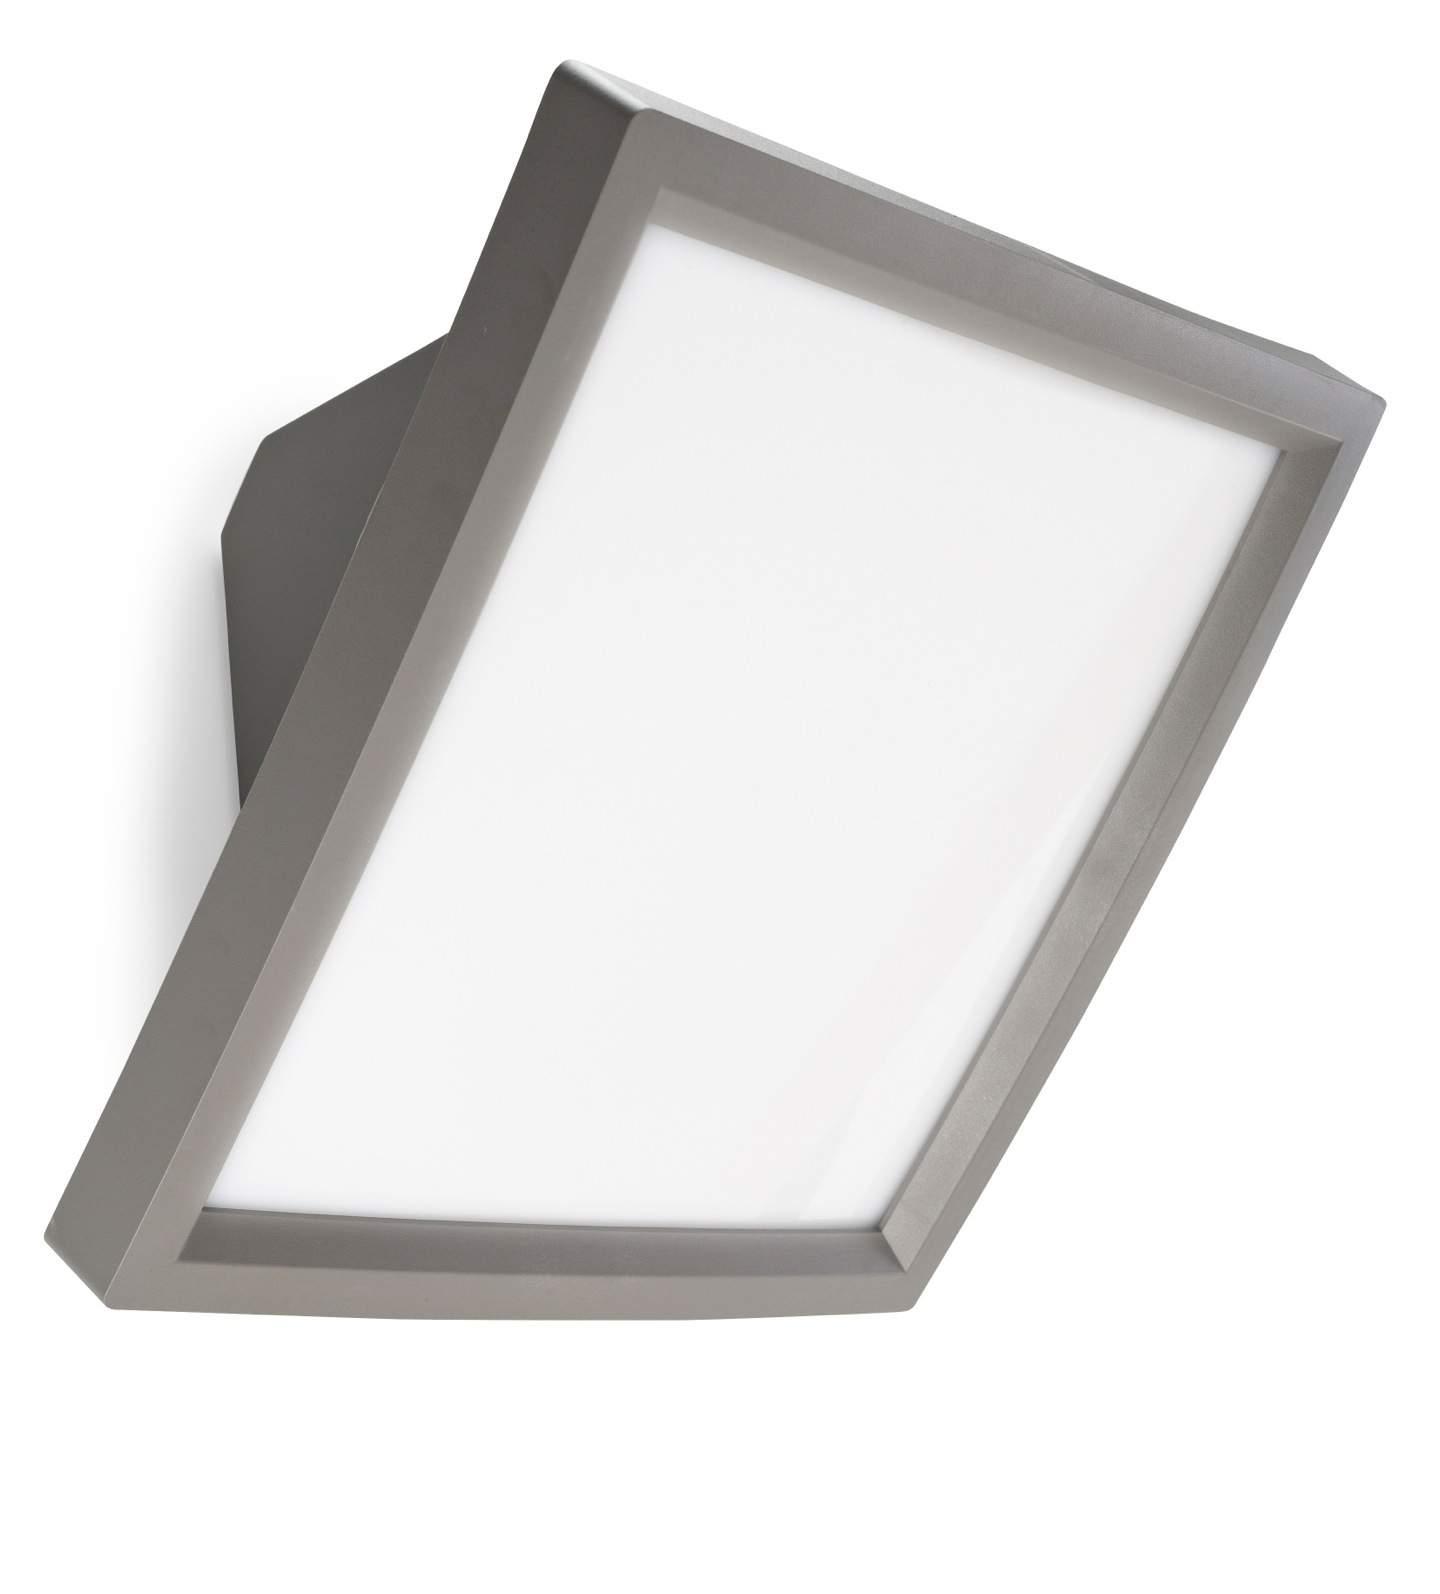 Access Wall Lamp 2xE27 MAX 18W Grey mate